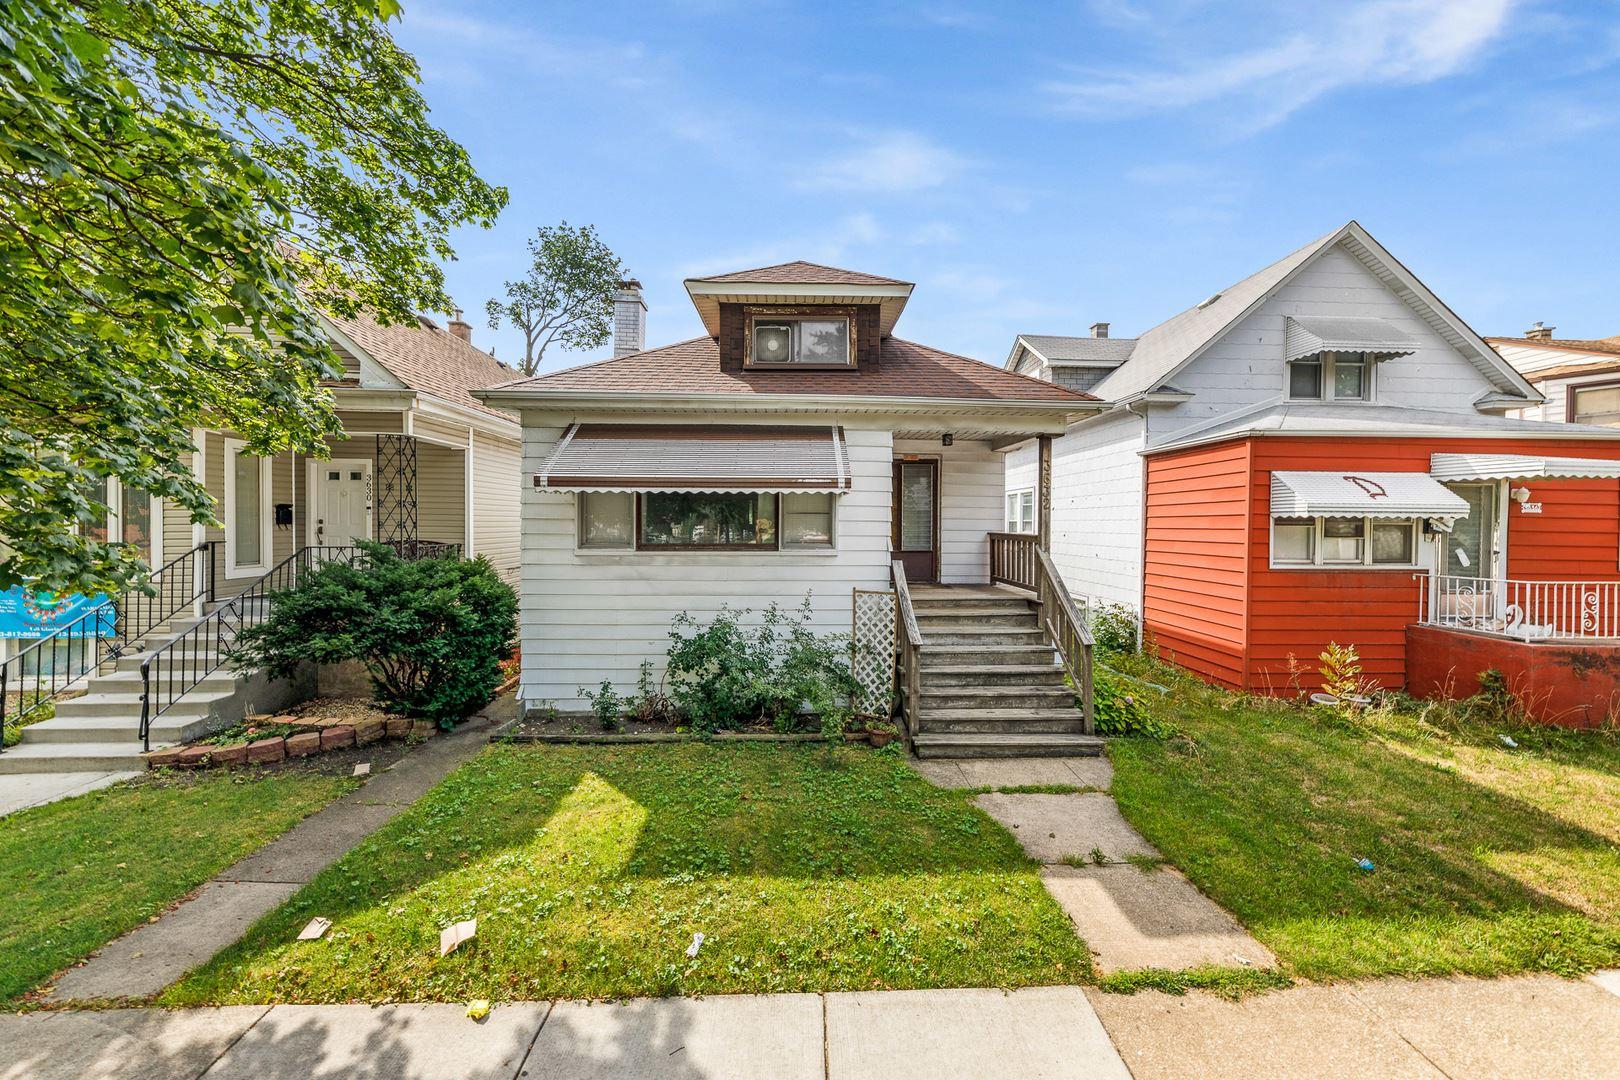 3632 N Long Avenue, Chicago, IL 60641 - #: 11209414